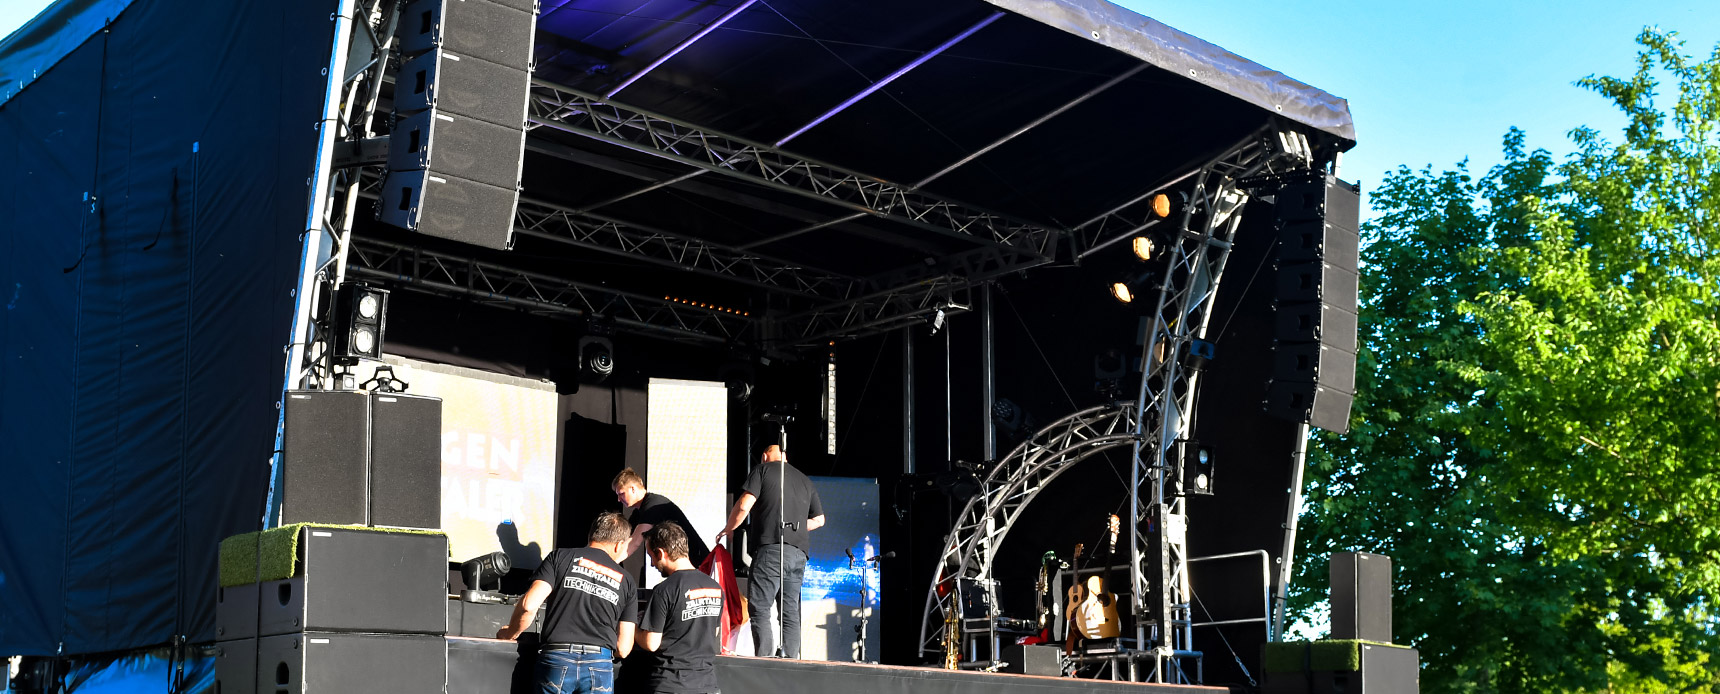 mobile Bühne SmartStage 50qm